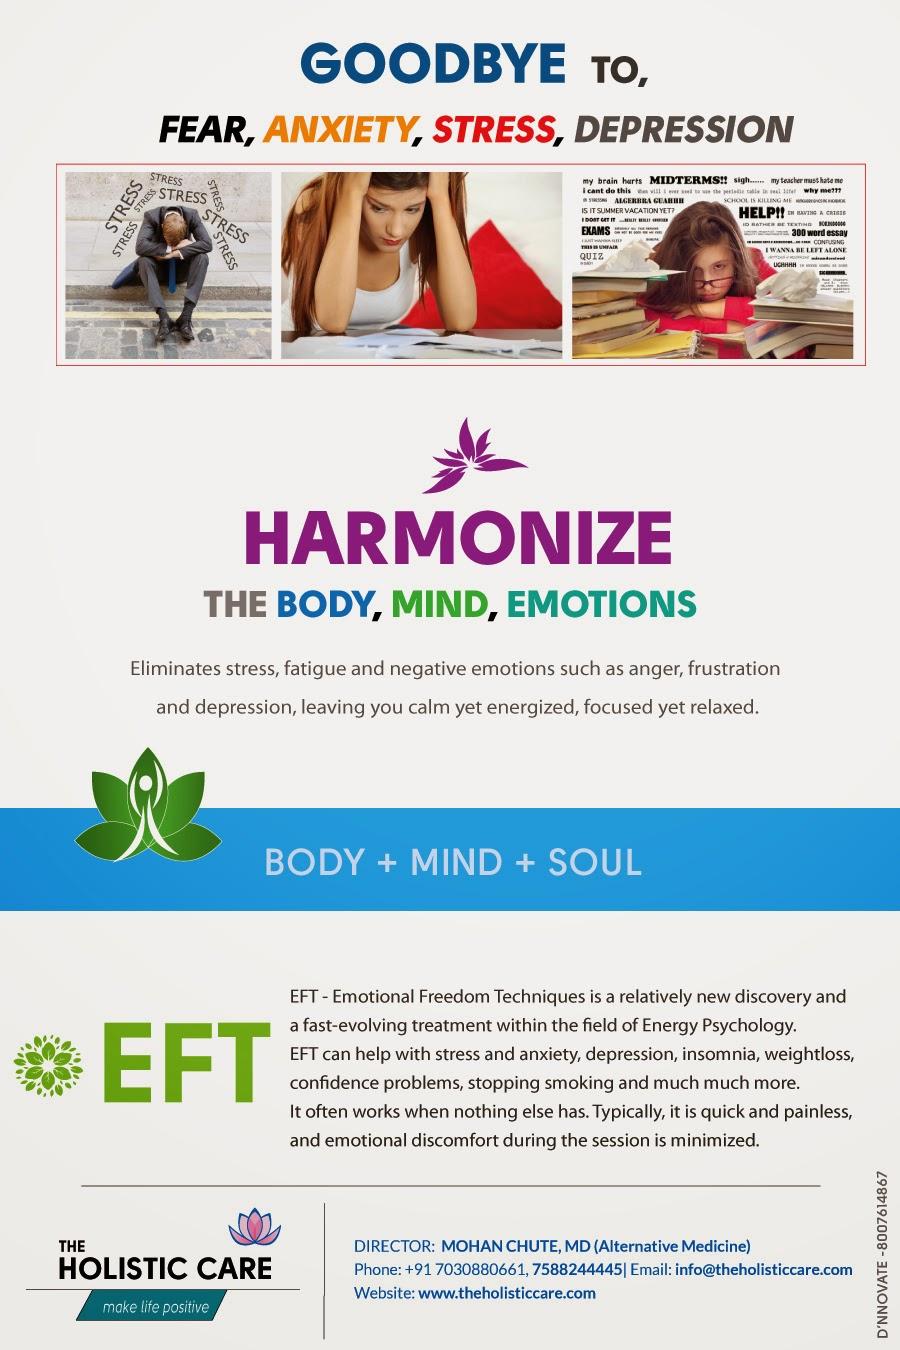 the holistic care reiki yoga naturopathy wellness centre the holistic care reiki yoga naturopathy wellness centre frenchise google